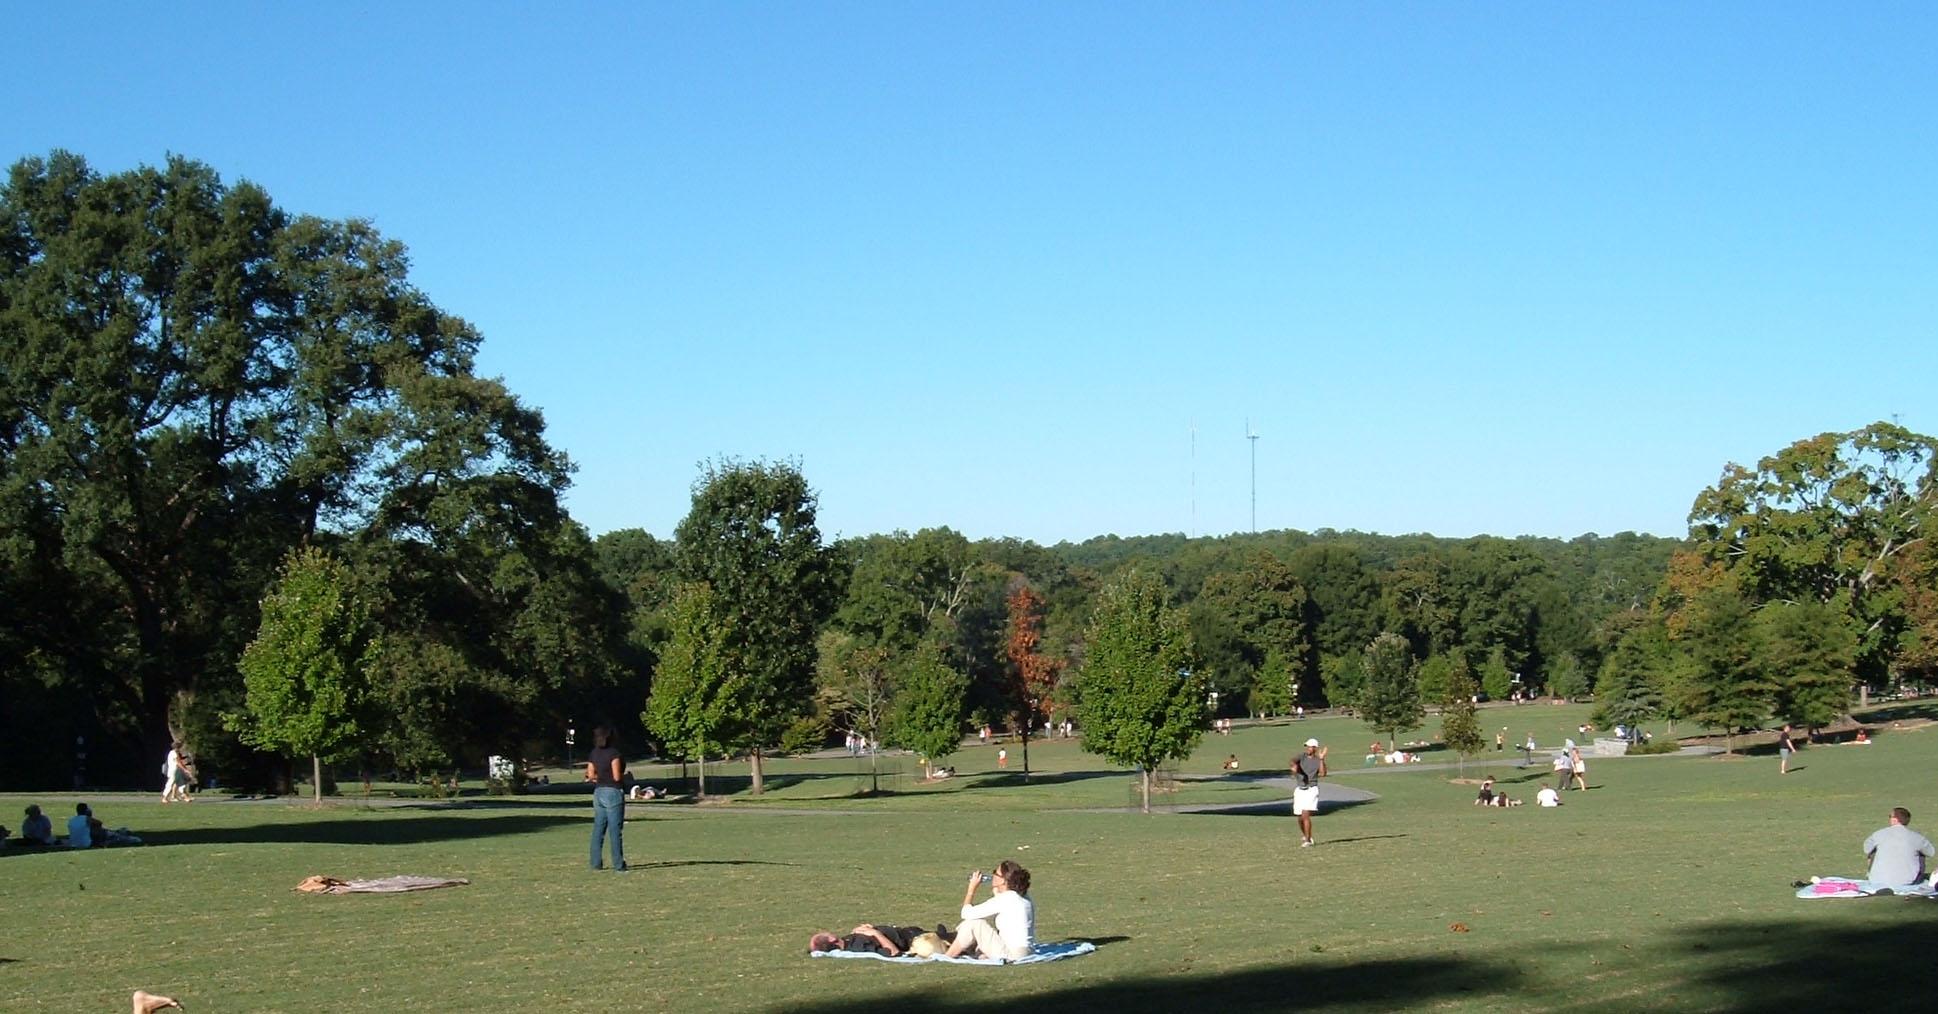 FilePiedmont Park Atlanta GA USA Fieldjpg Wikimedia Commons - Ga usa